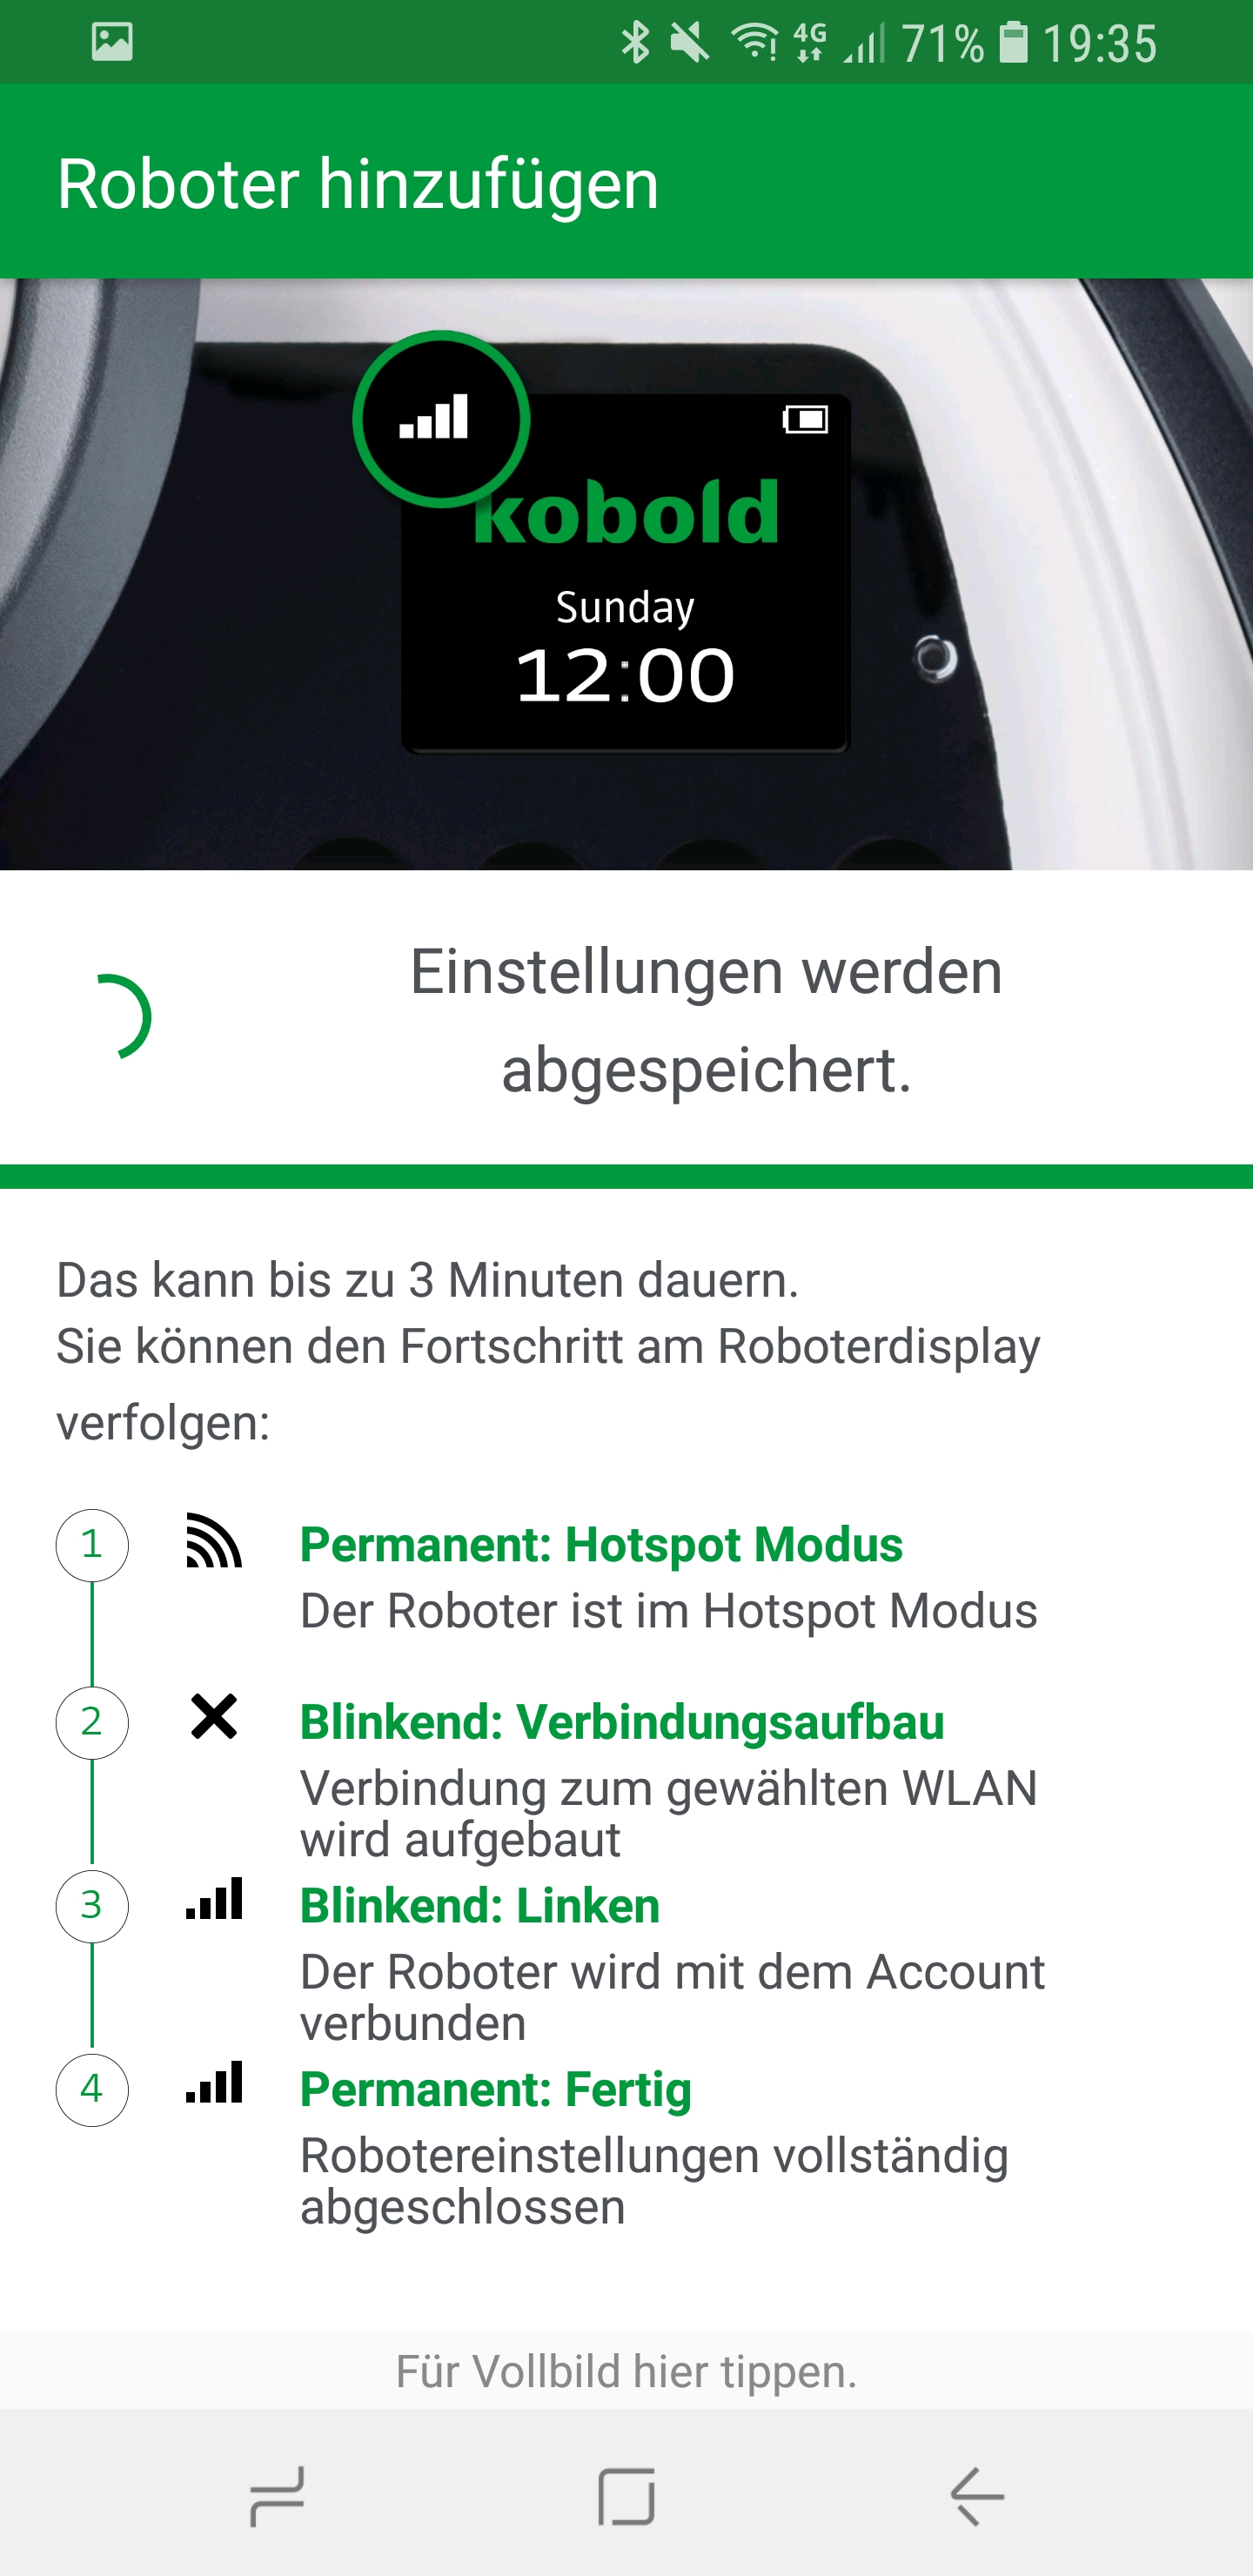 Vorwerk Kobold App Roboter hinzufügen 07